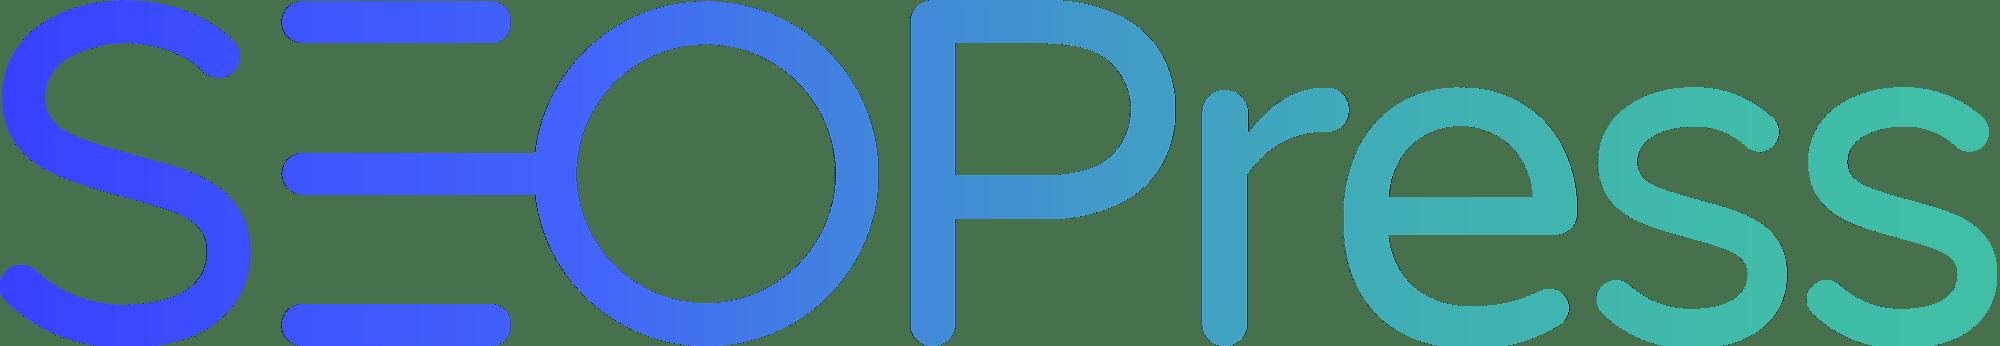 SEOPress Logo WPism WordPress